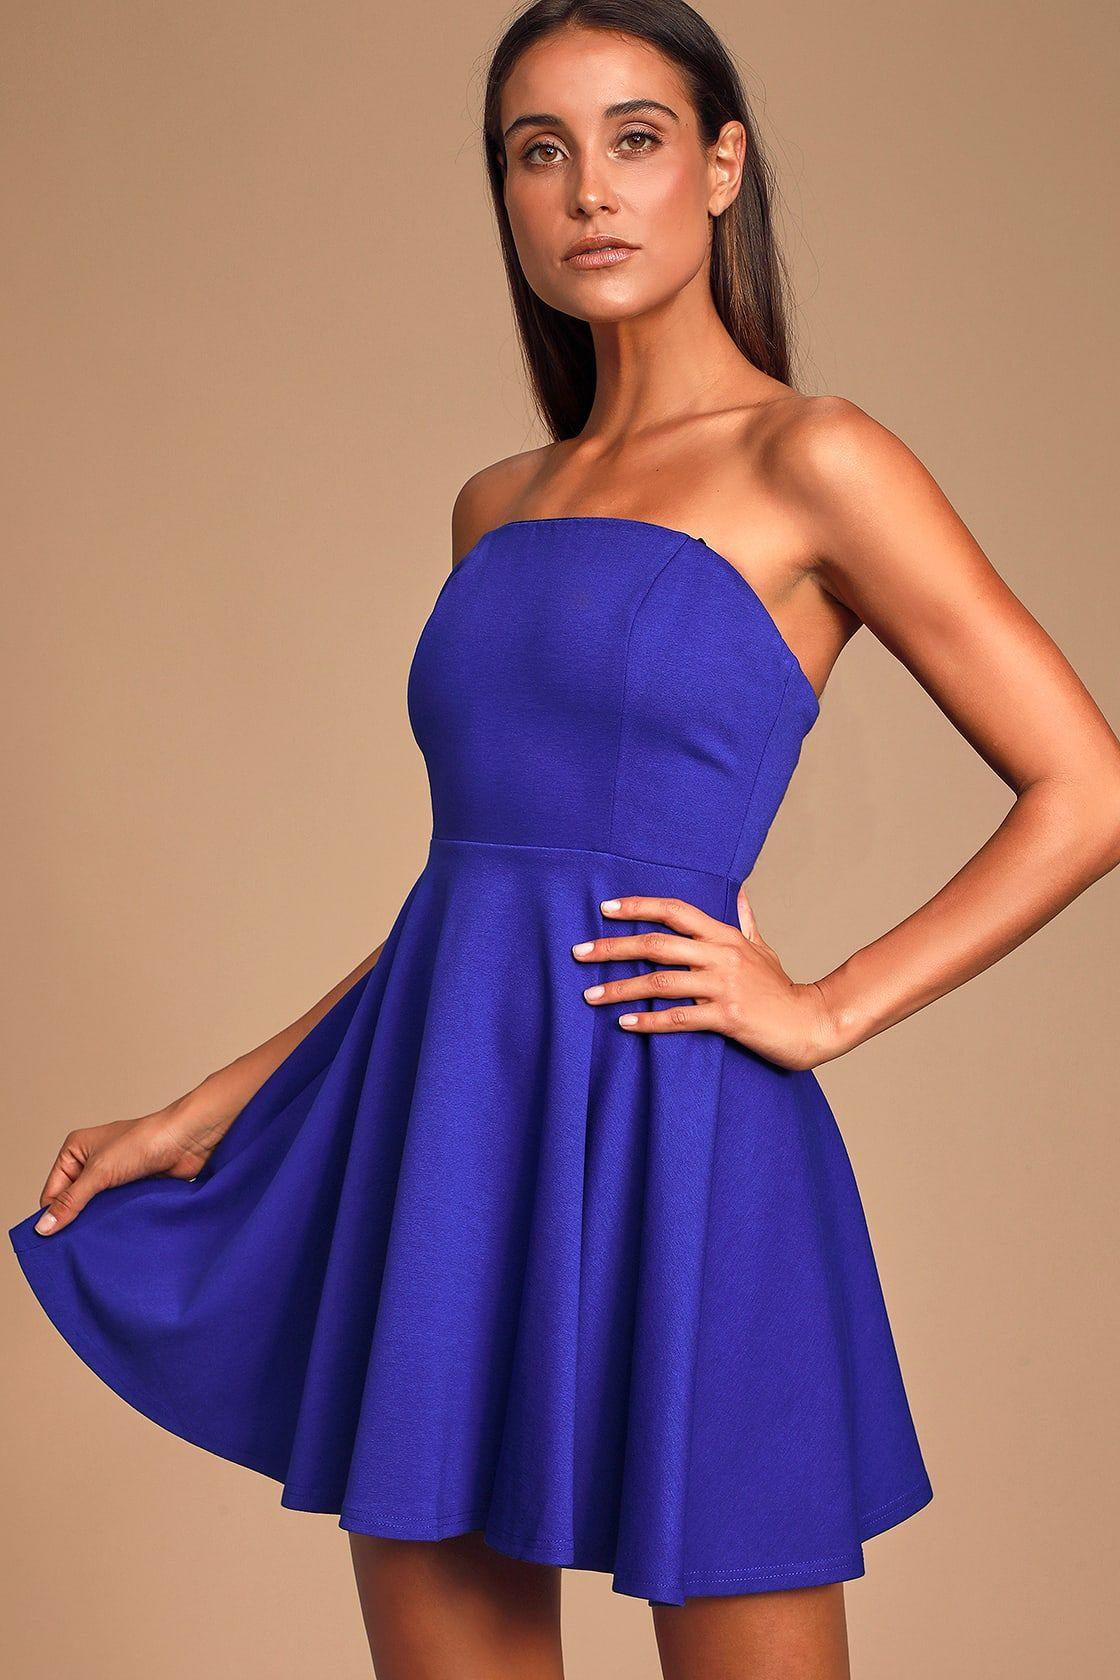 About A Twirl Royal Blue Strapless Skater Dress White Lace Skater Dress Dresses Women Dress Online [ 1680 x 1120 Pixel ]